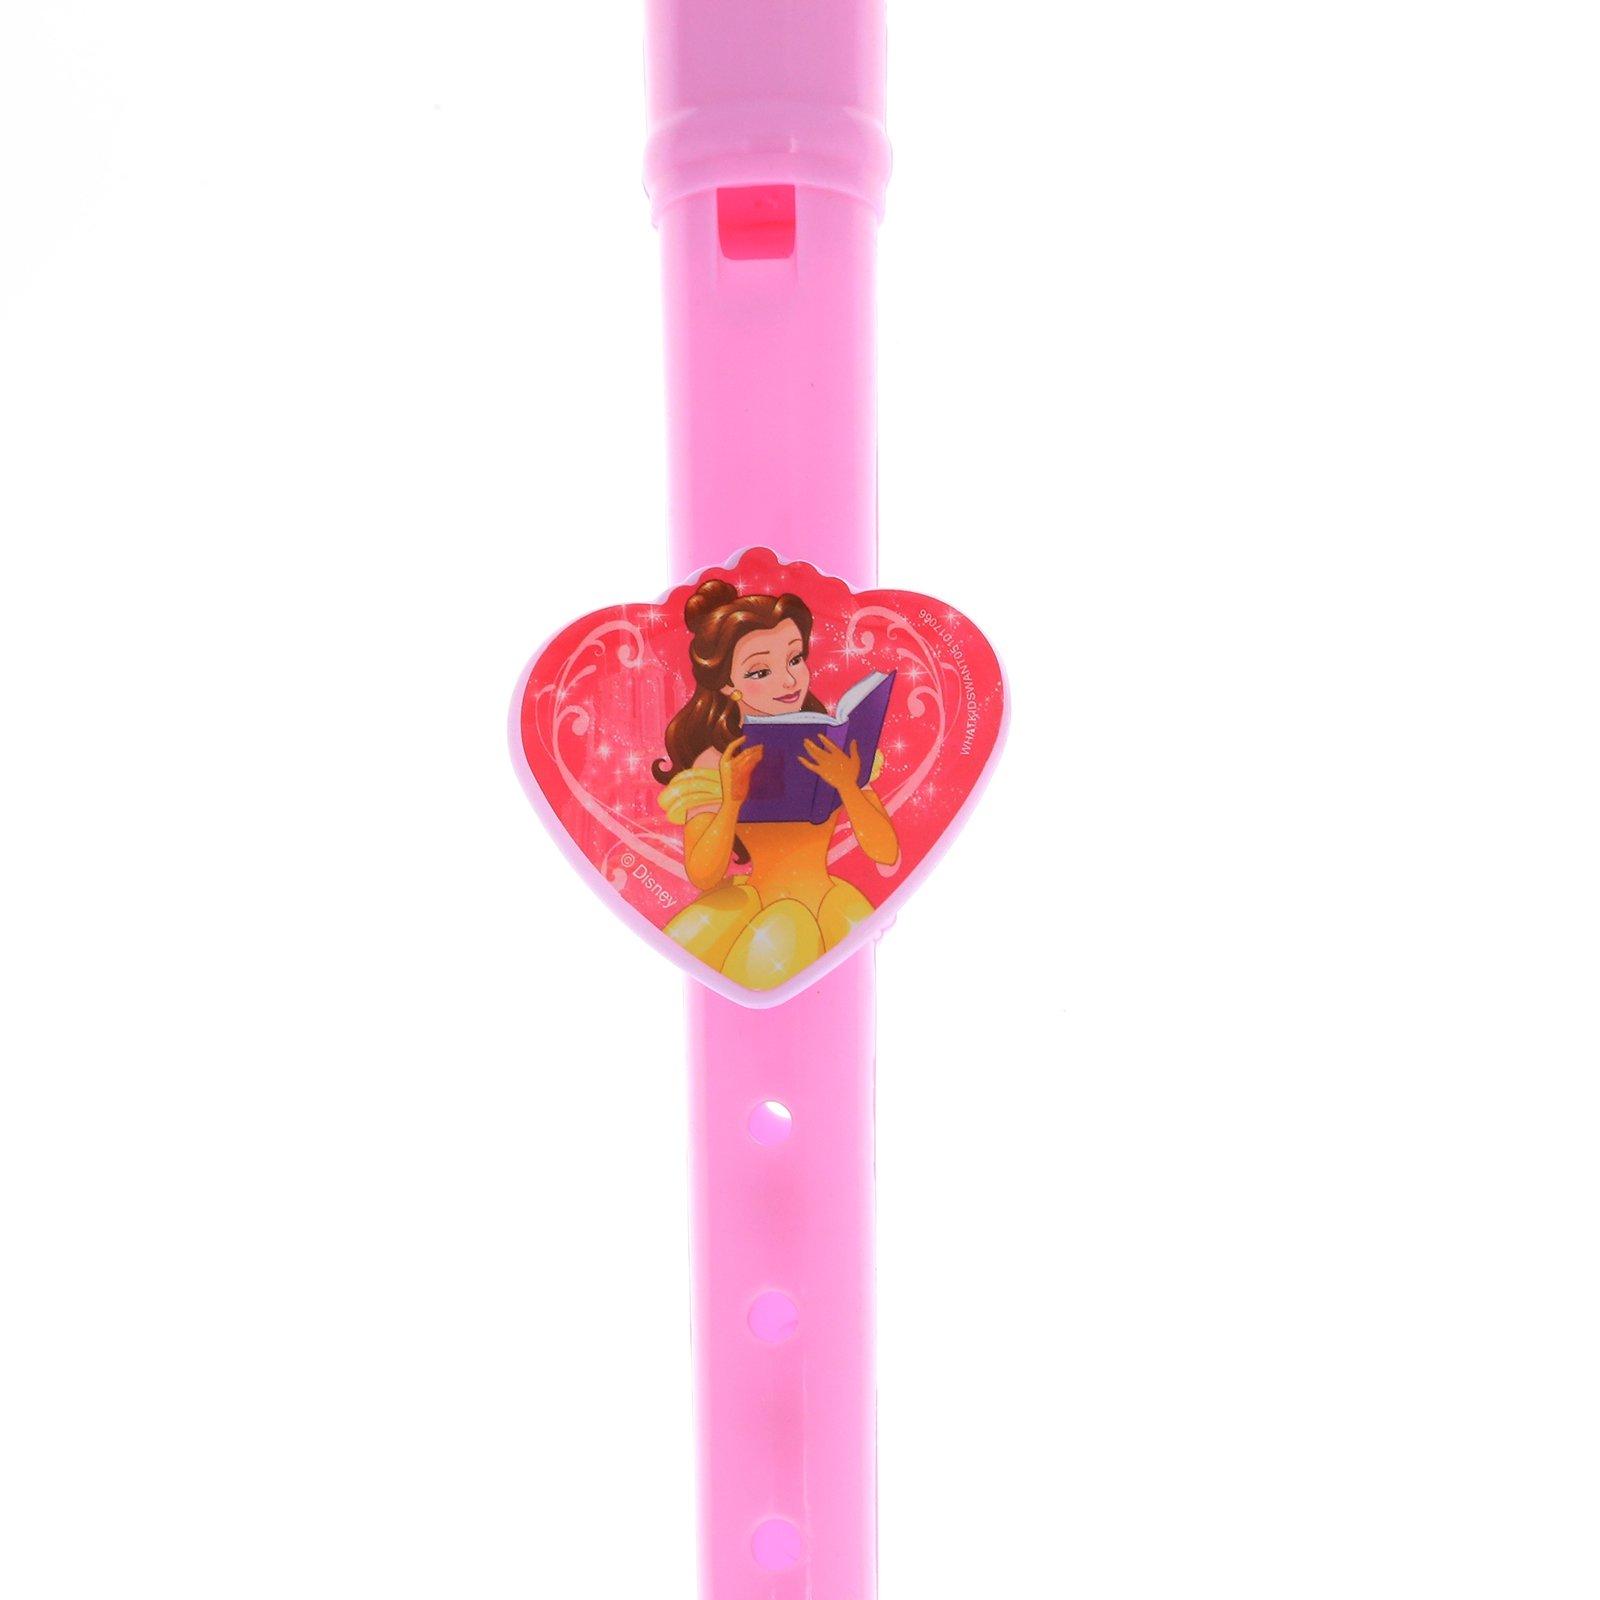 Disney Princess Flute Recorder Kids Musical Instrument Educational Toy